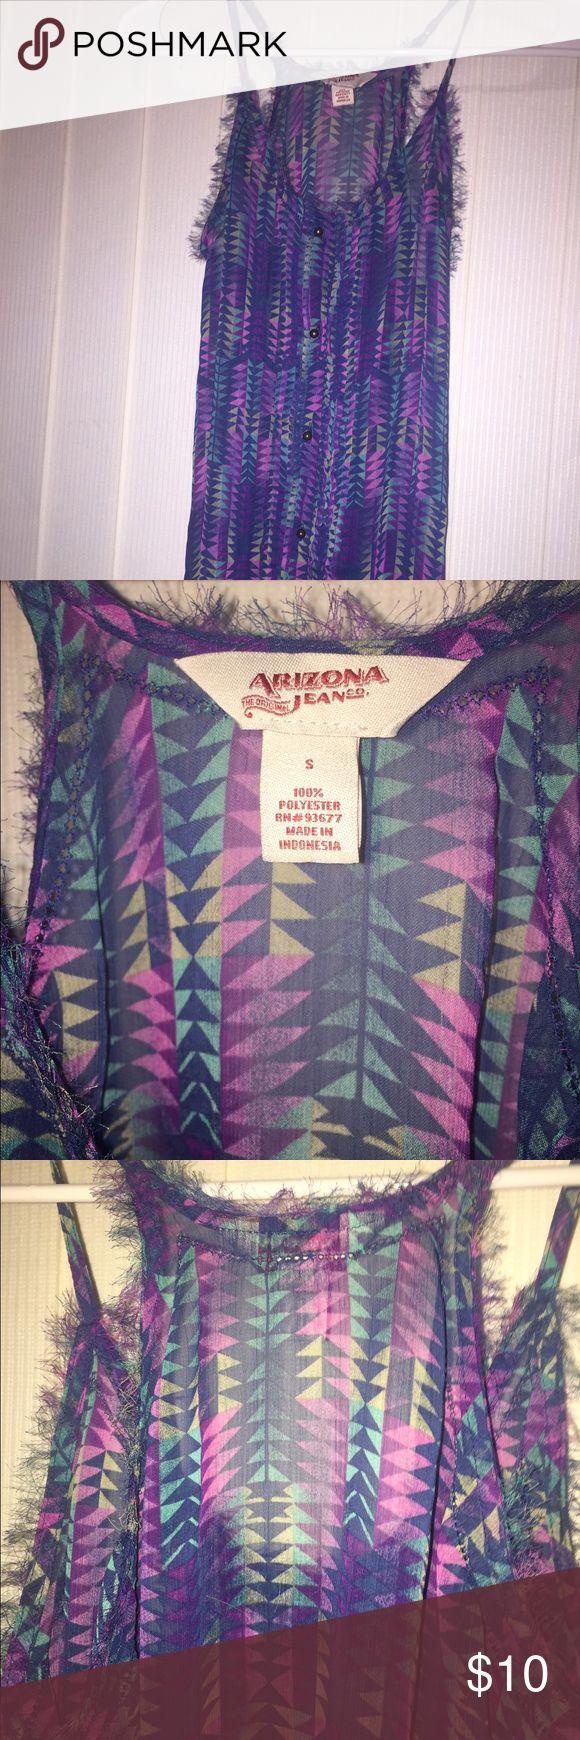 SM Sheer Arizona Tank SM, Sheer Aztec Print, Arizona tank top. Very cute with bralette or bandeau. Great for the hot summer 😉 Arizona Jean Company Tops Tank Tops